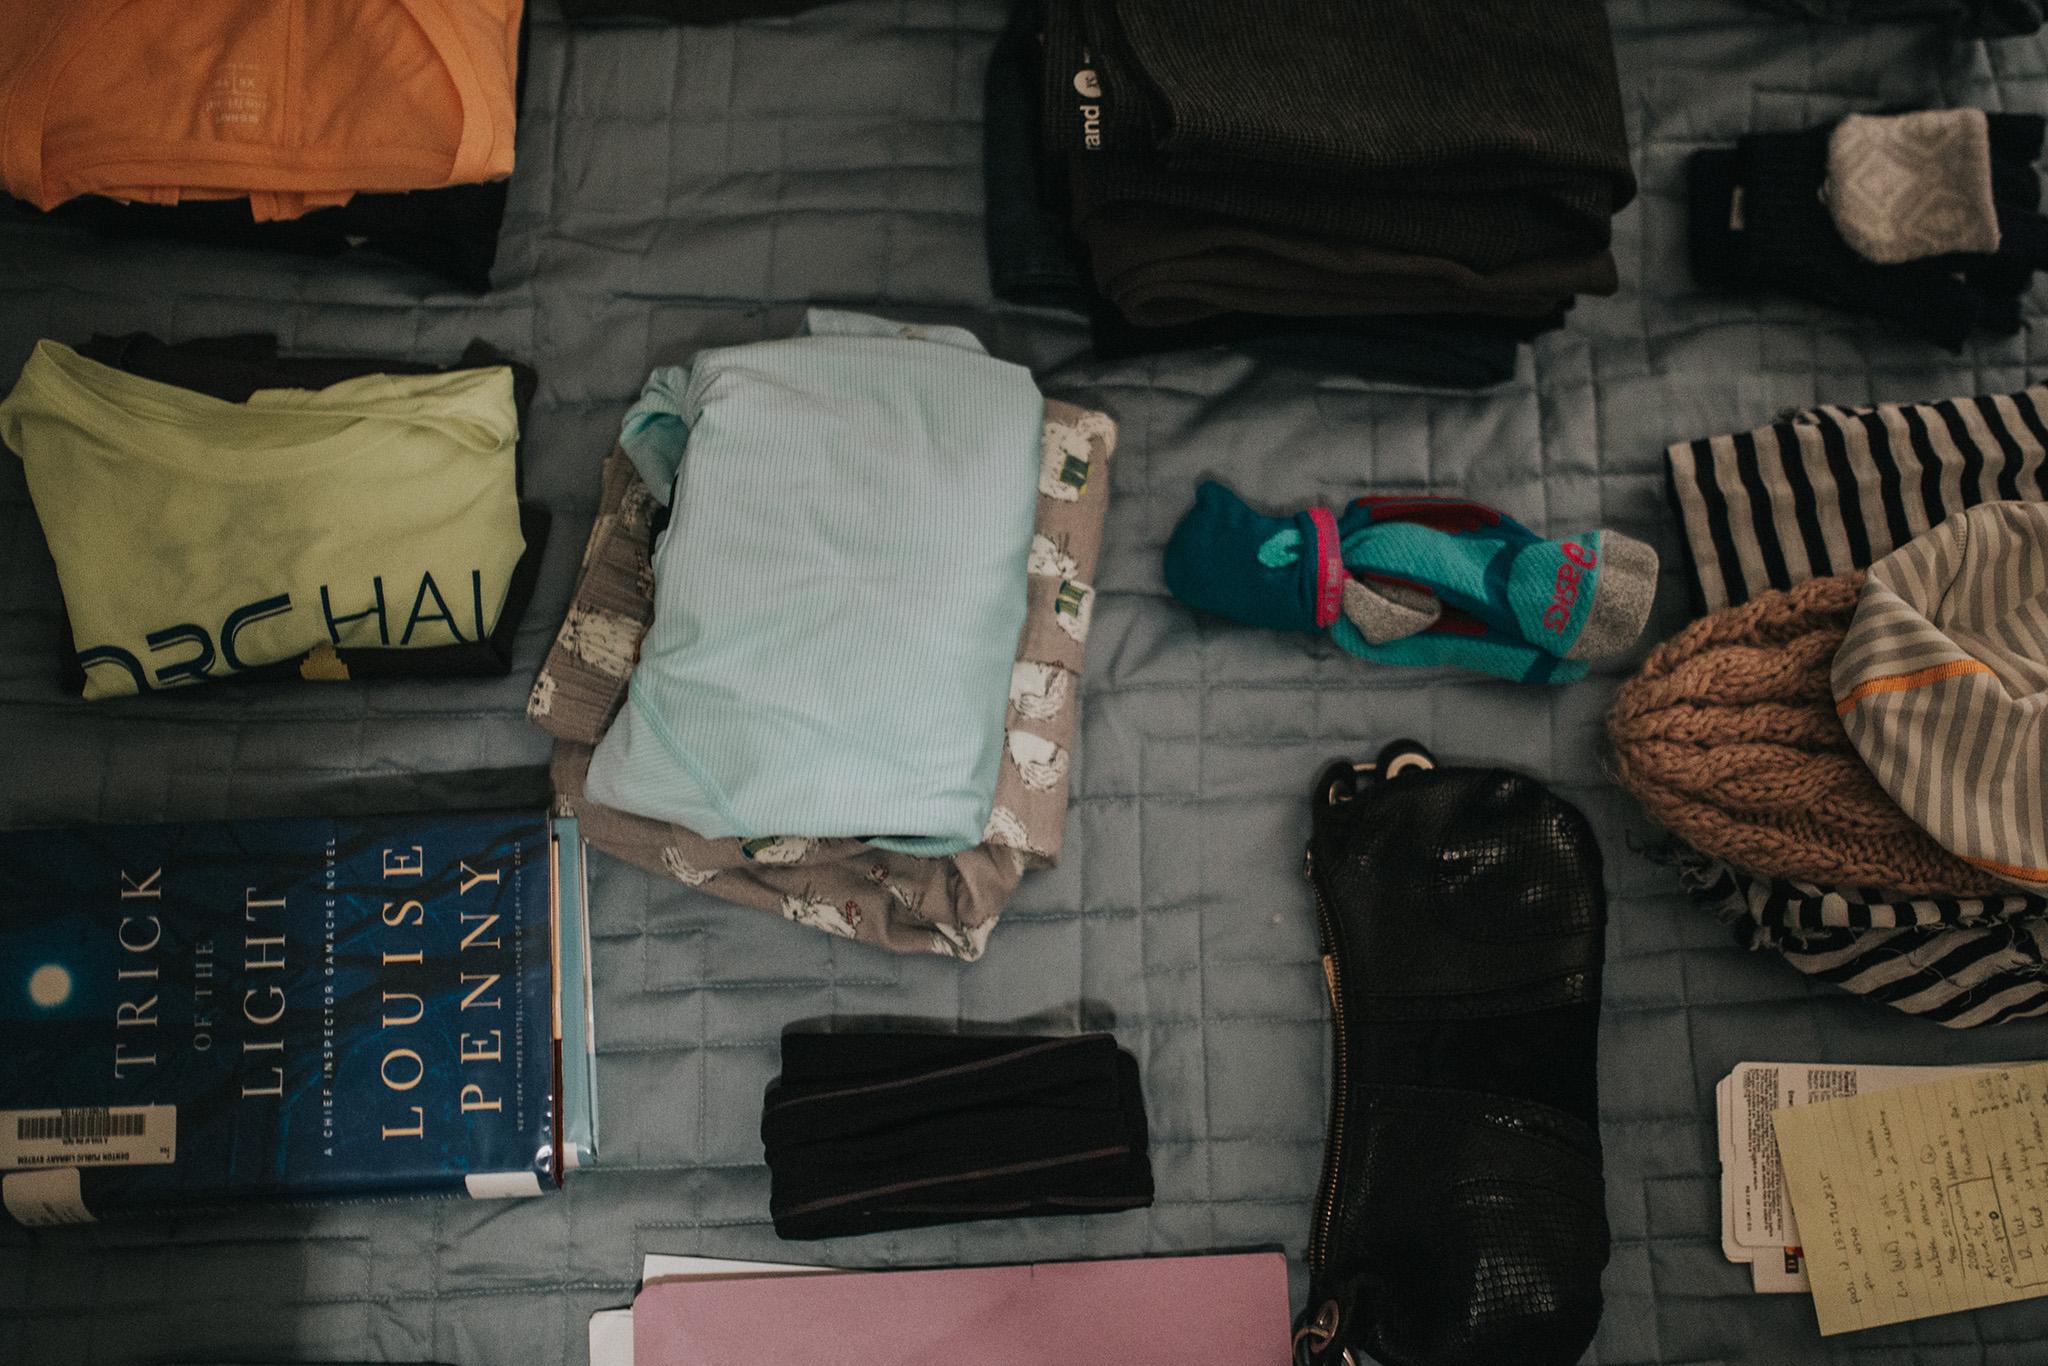 February 17: Packing.